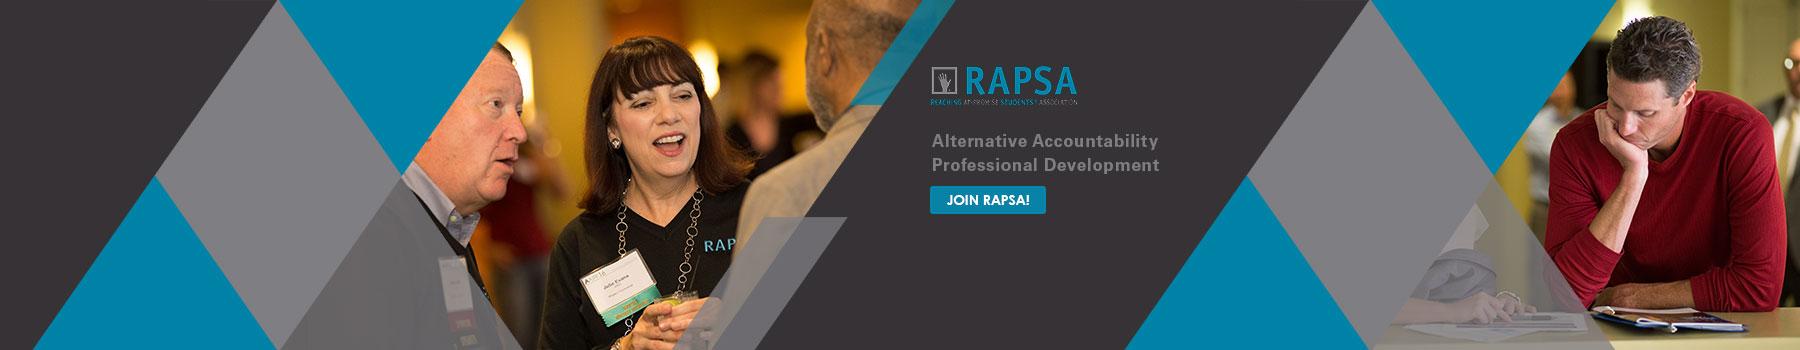 RAPSA-banner-home-webinars-long-6